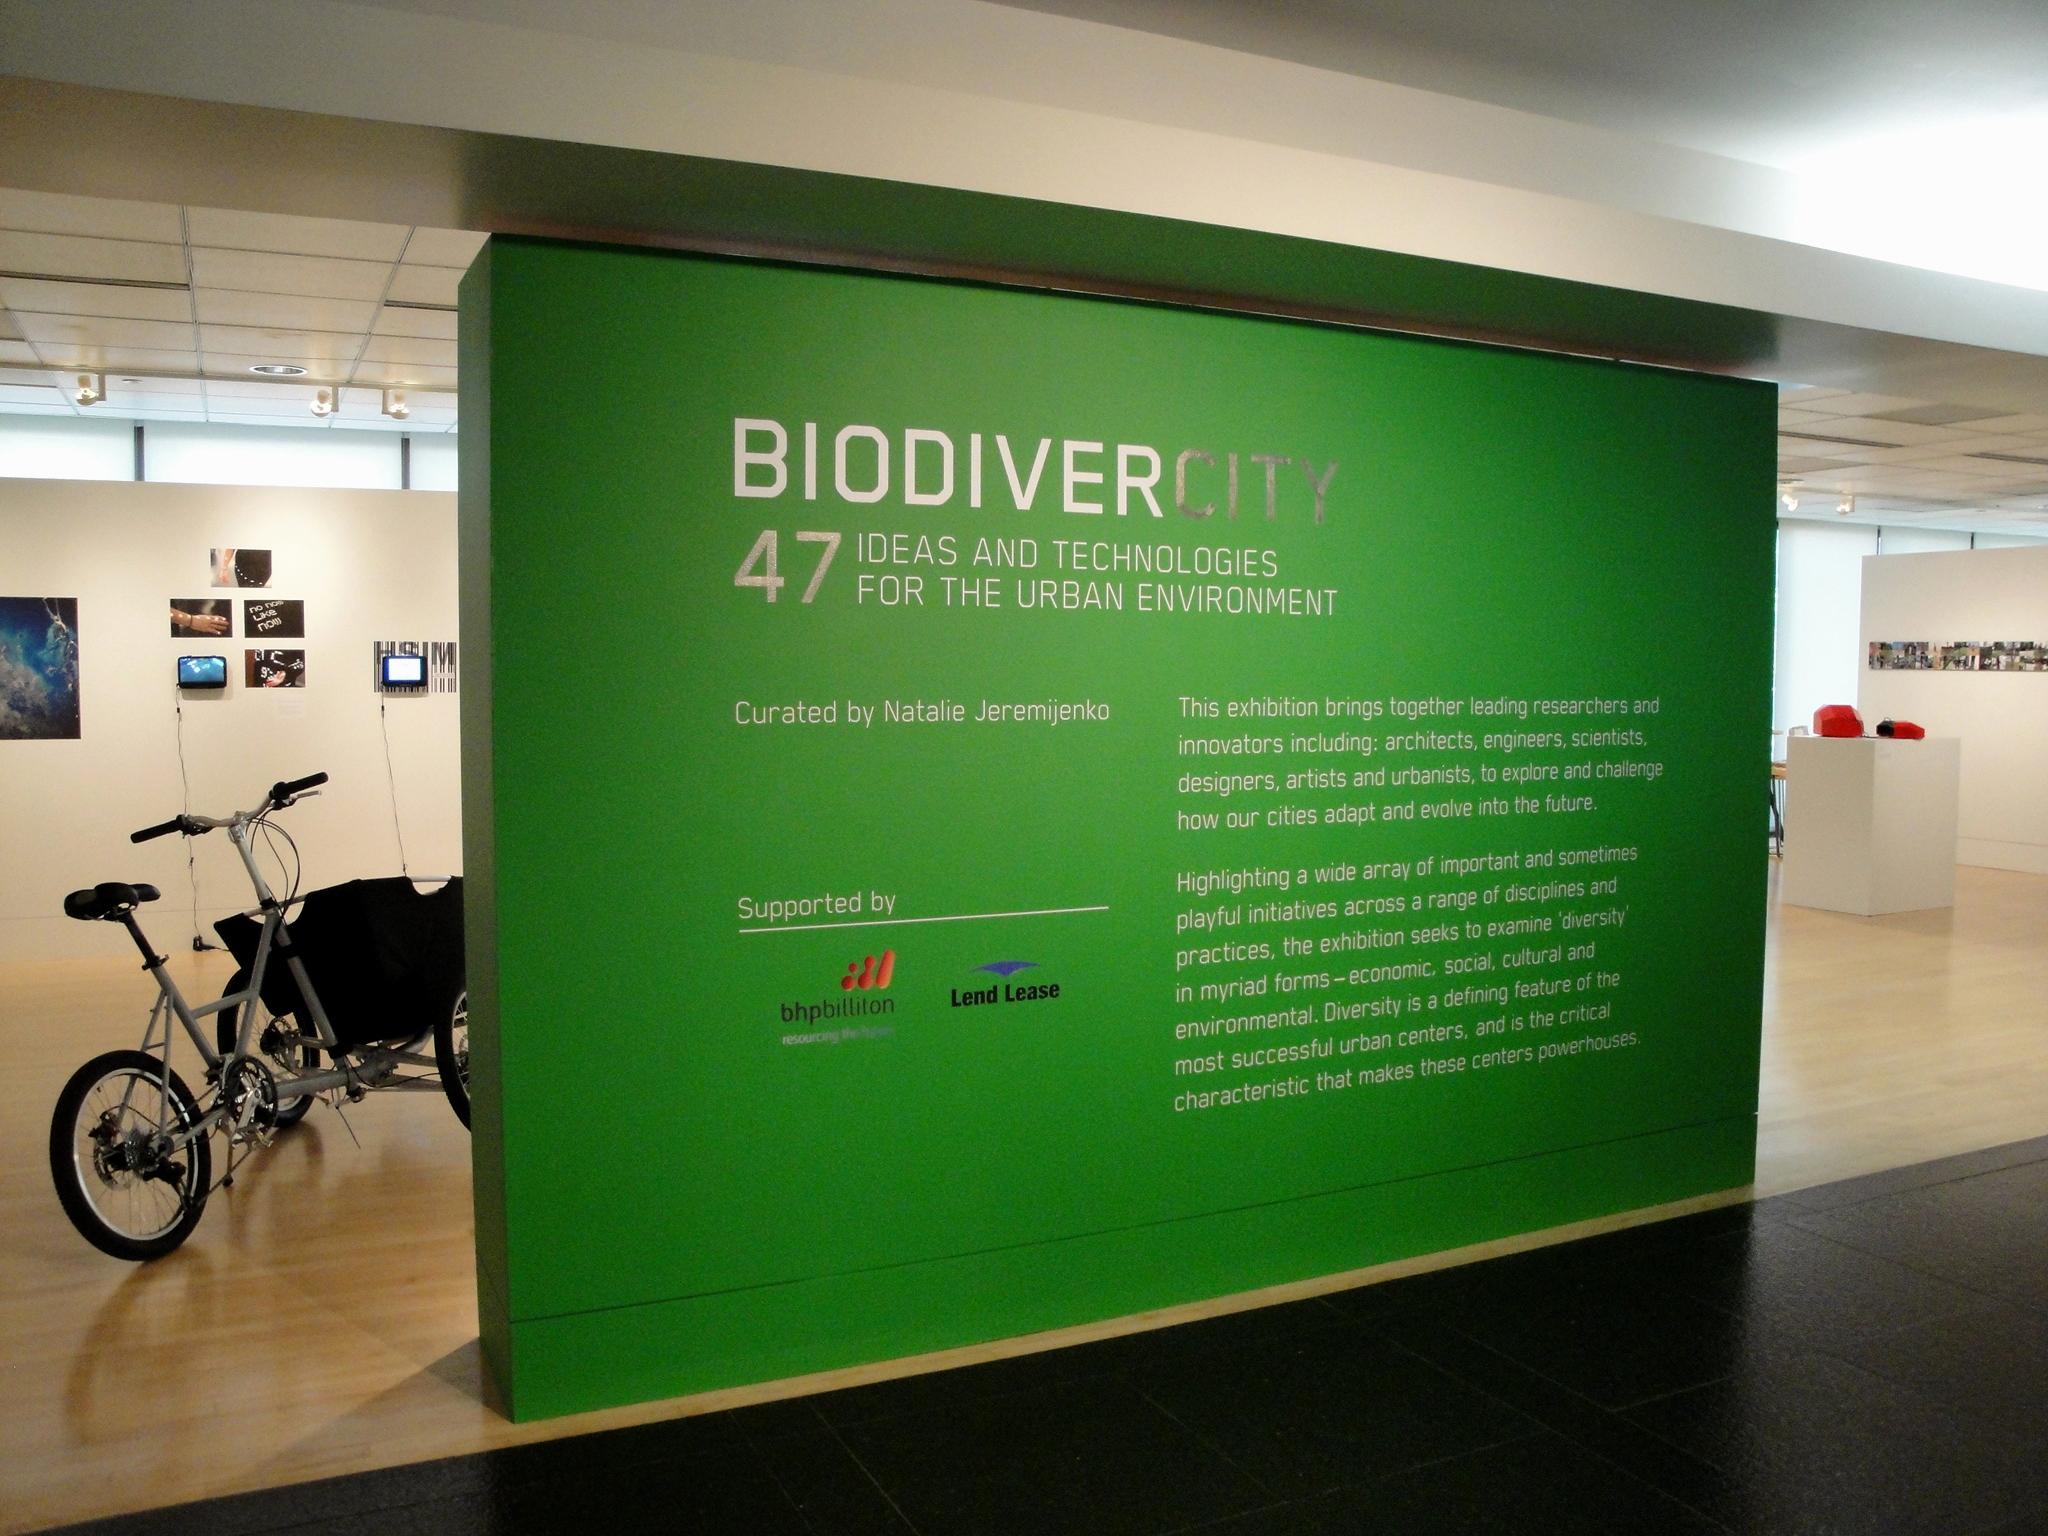 BiodiverCity - Embassy of Australia - Washington D.C.